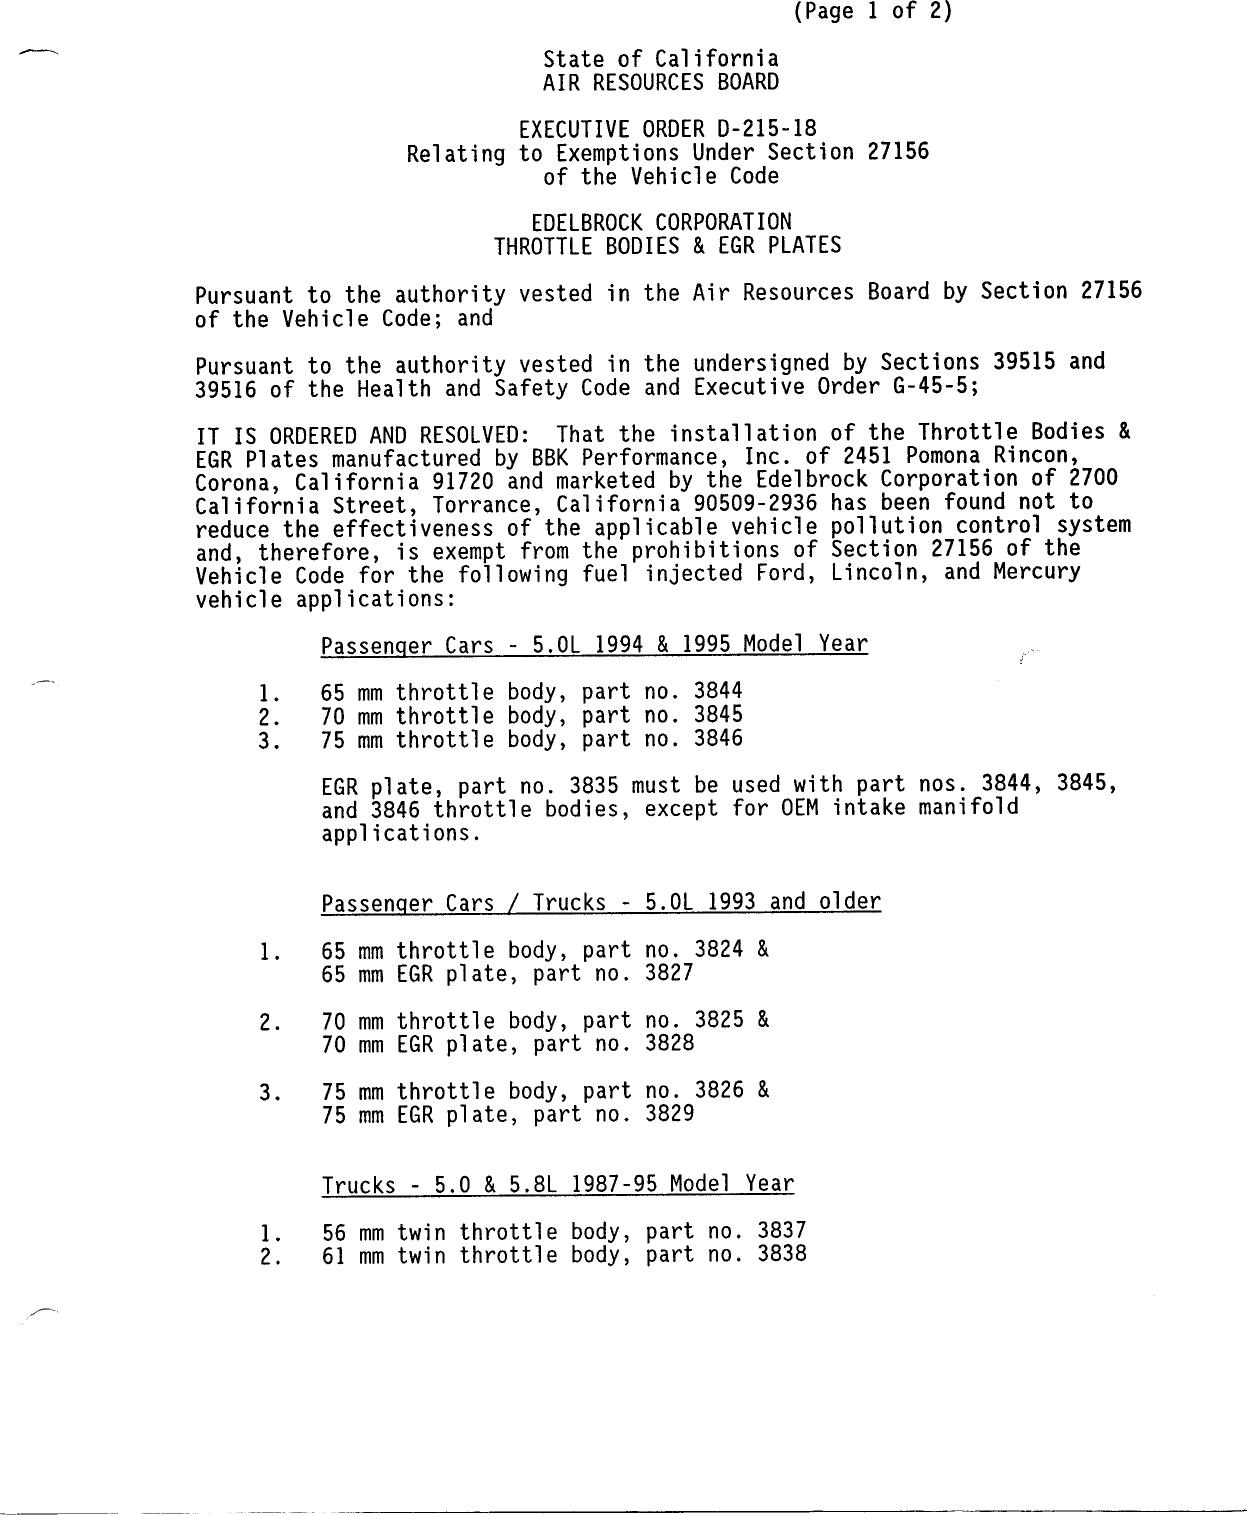 Executive Order D-215-18 Edelbrock